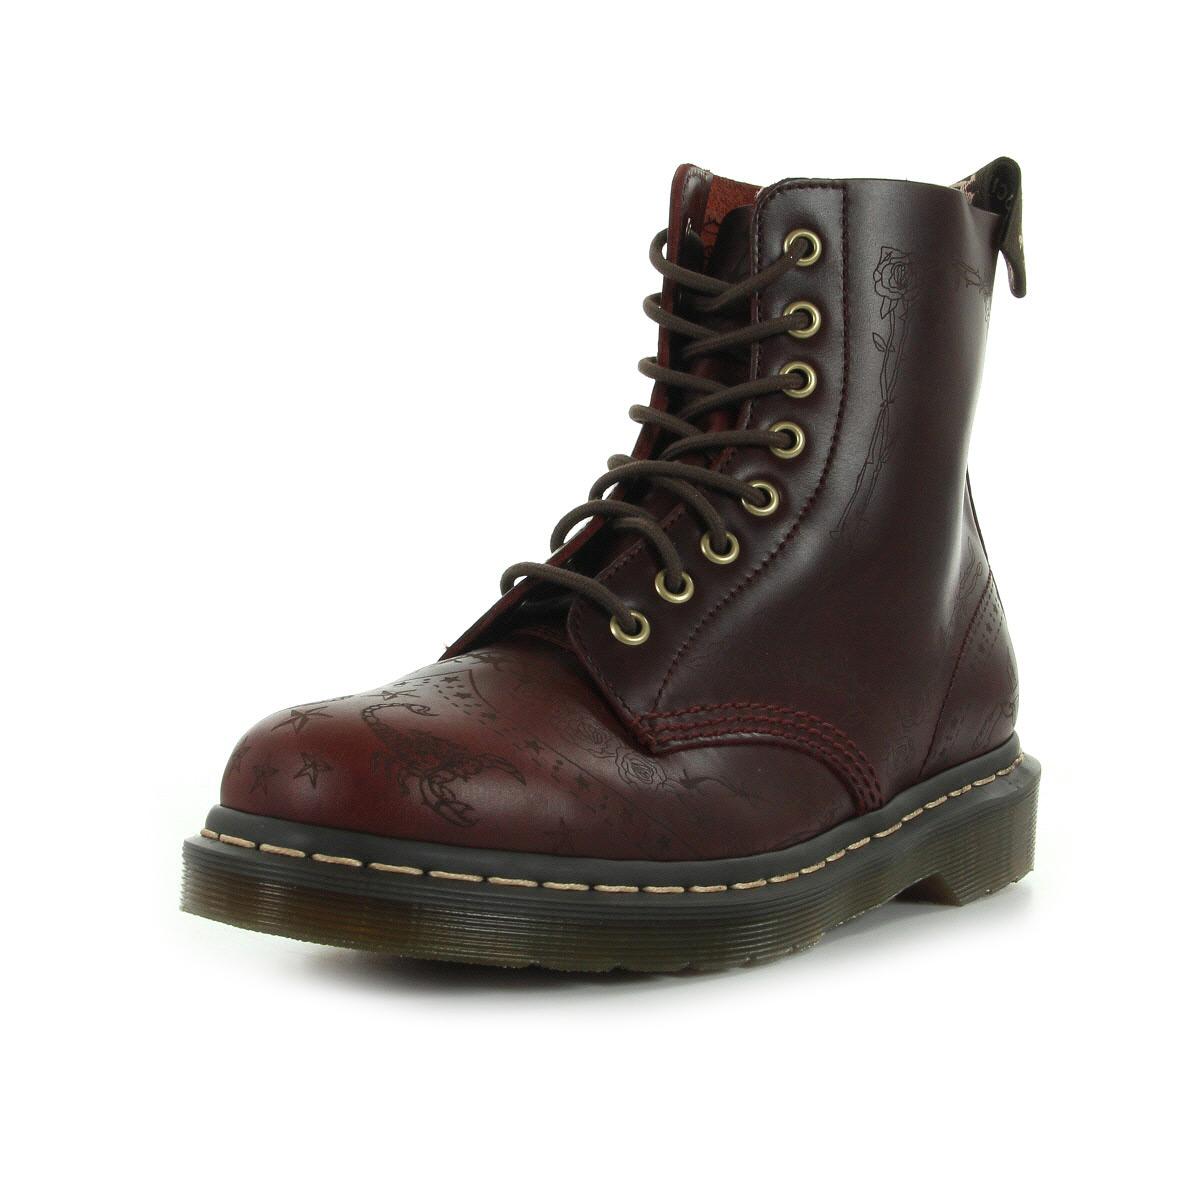 bottines doc martens homme darci brando taille marron cuir lacets ebay. Black Bedroom Furniture Sets. Home Design Ideas